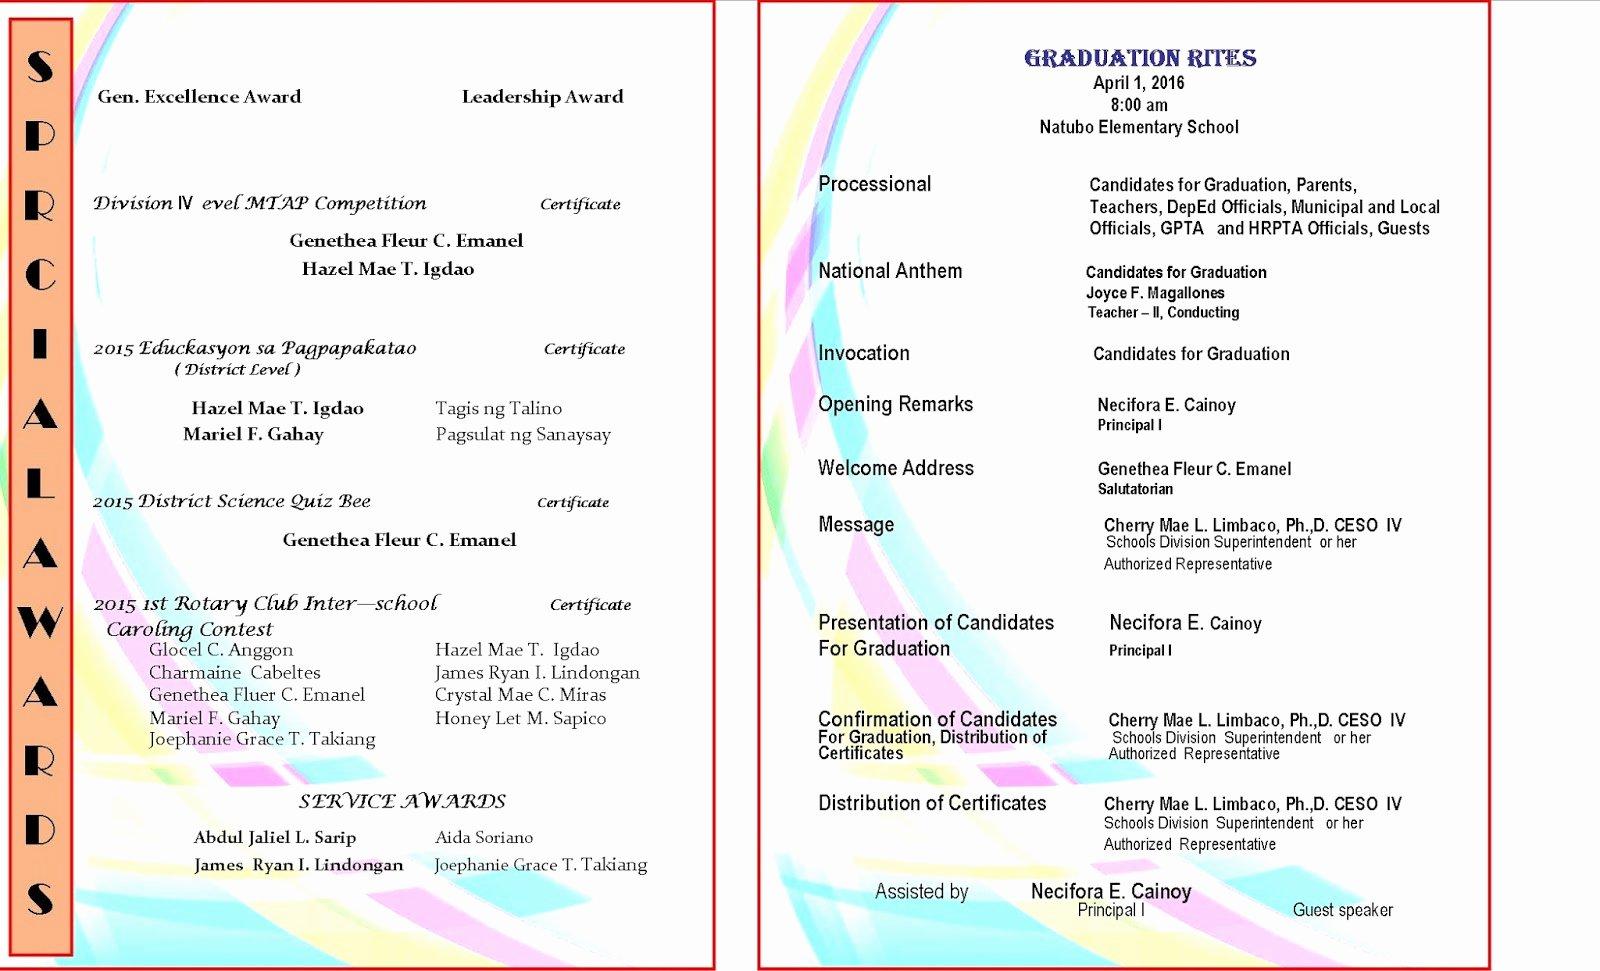 Free Printable Preschool Graduation Program Templates Beautiful 2015 2016 Graduation Program New Template Deped Lp S